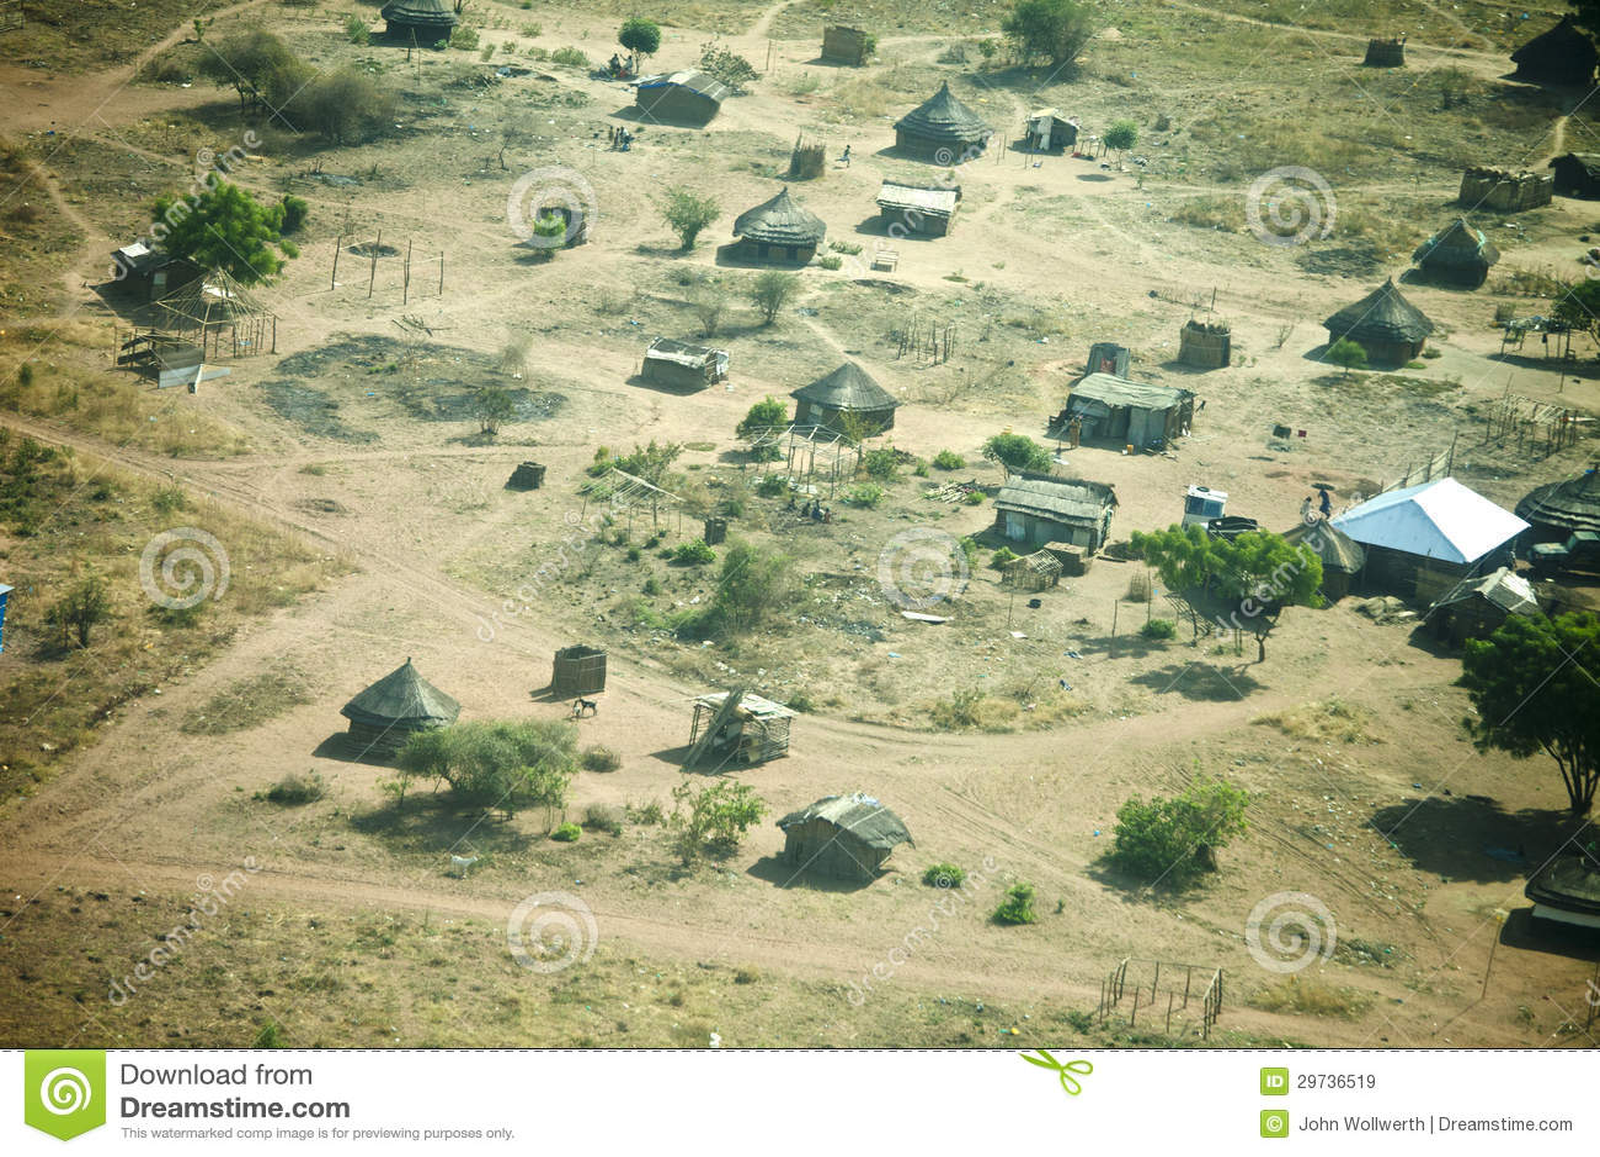 Aerial View Of Juba, South Sudan Stock Image - Image of tropical